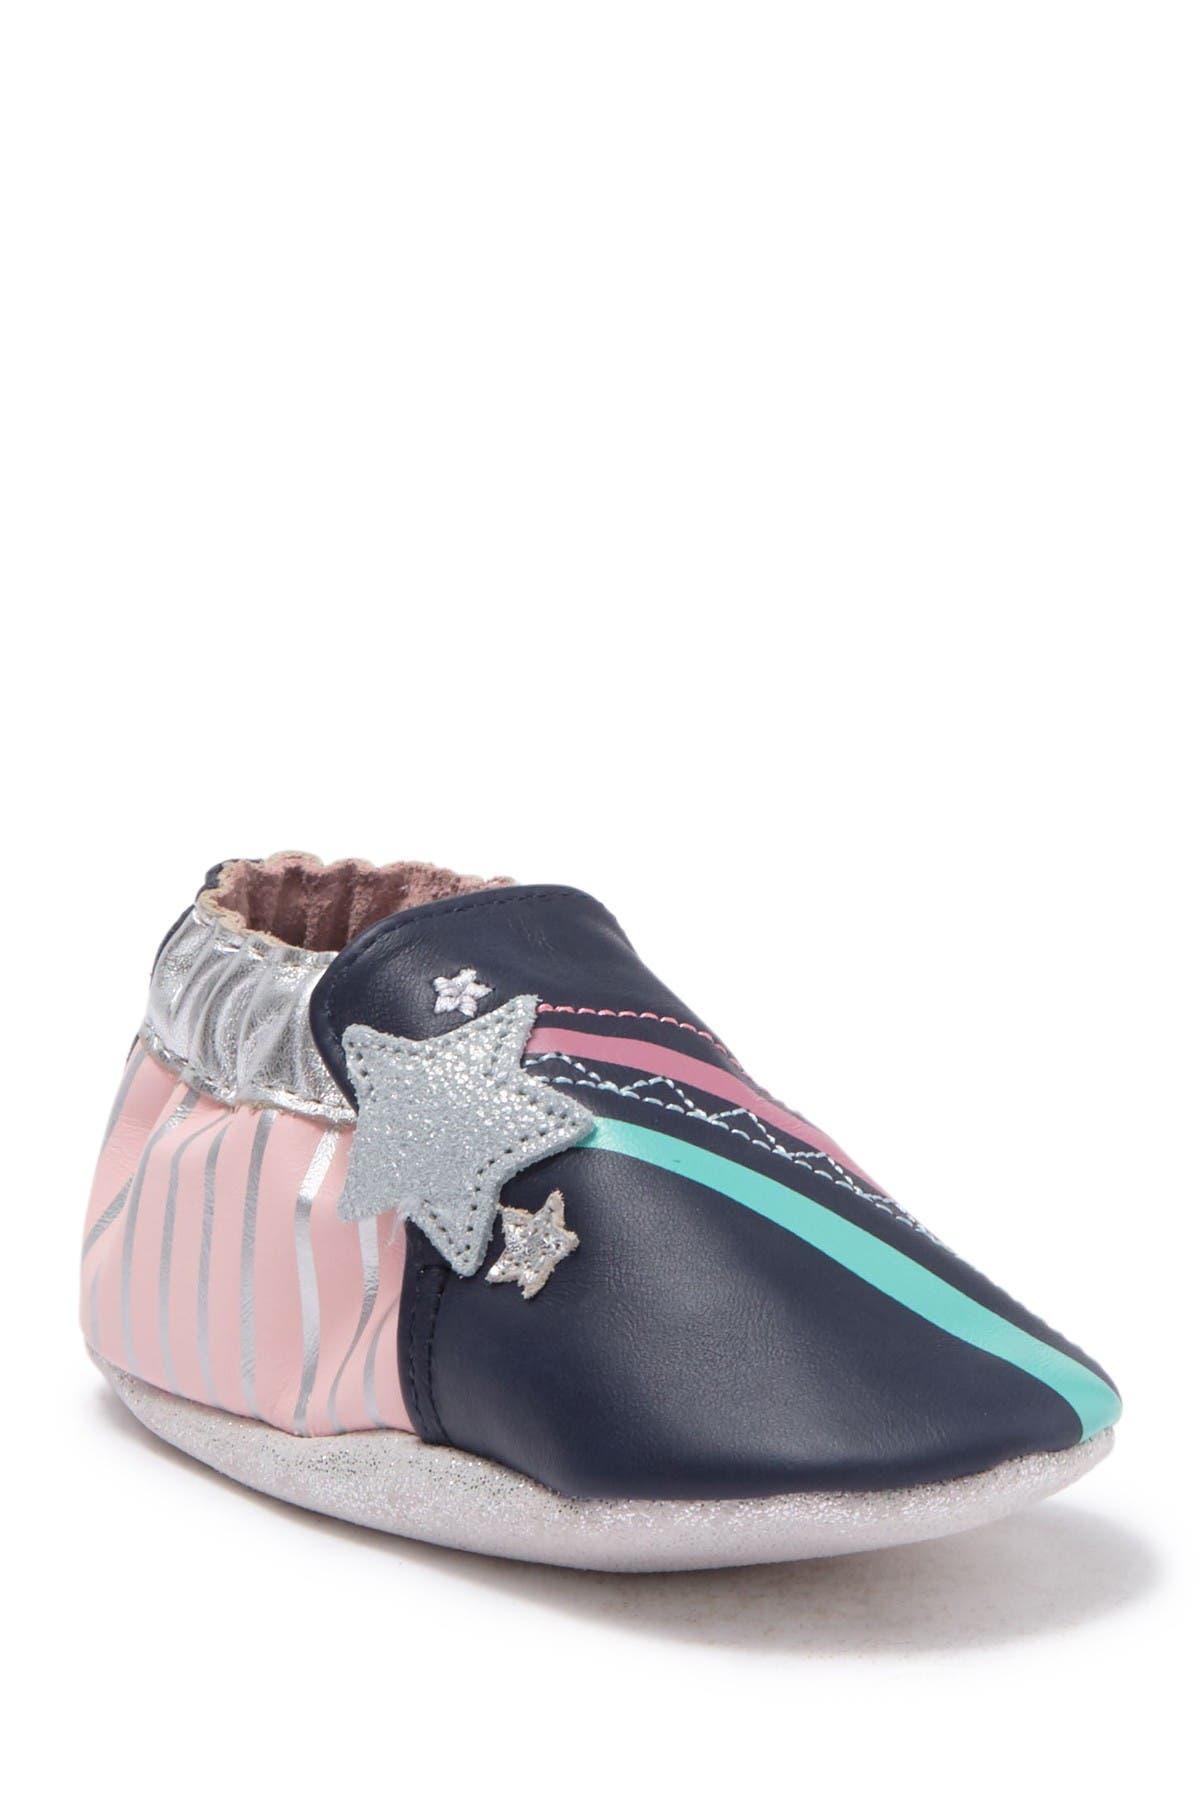 Image of Robeez Aurora Leather Slip-On Shoe